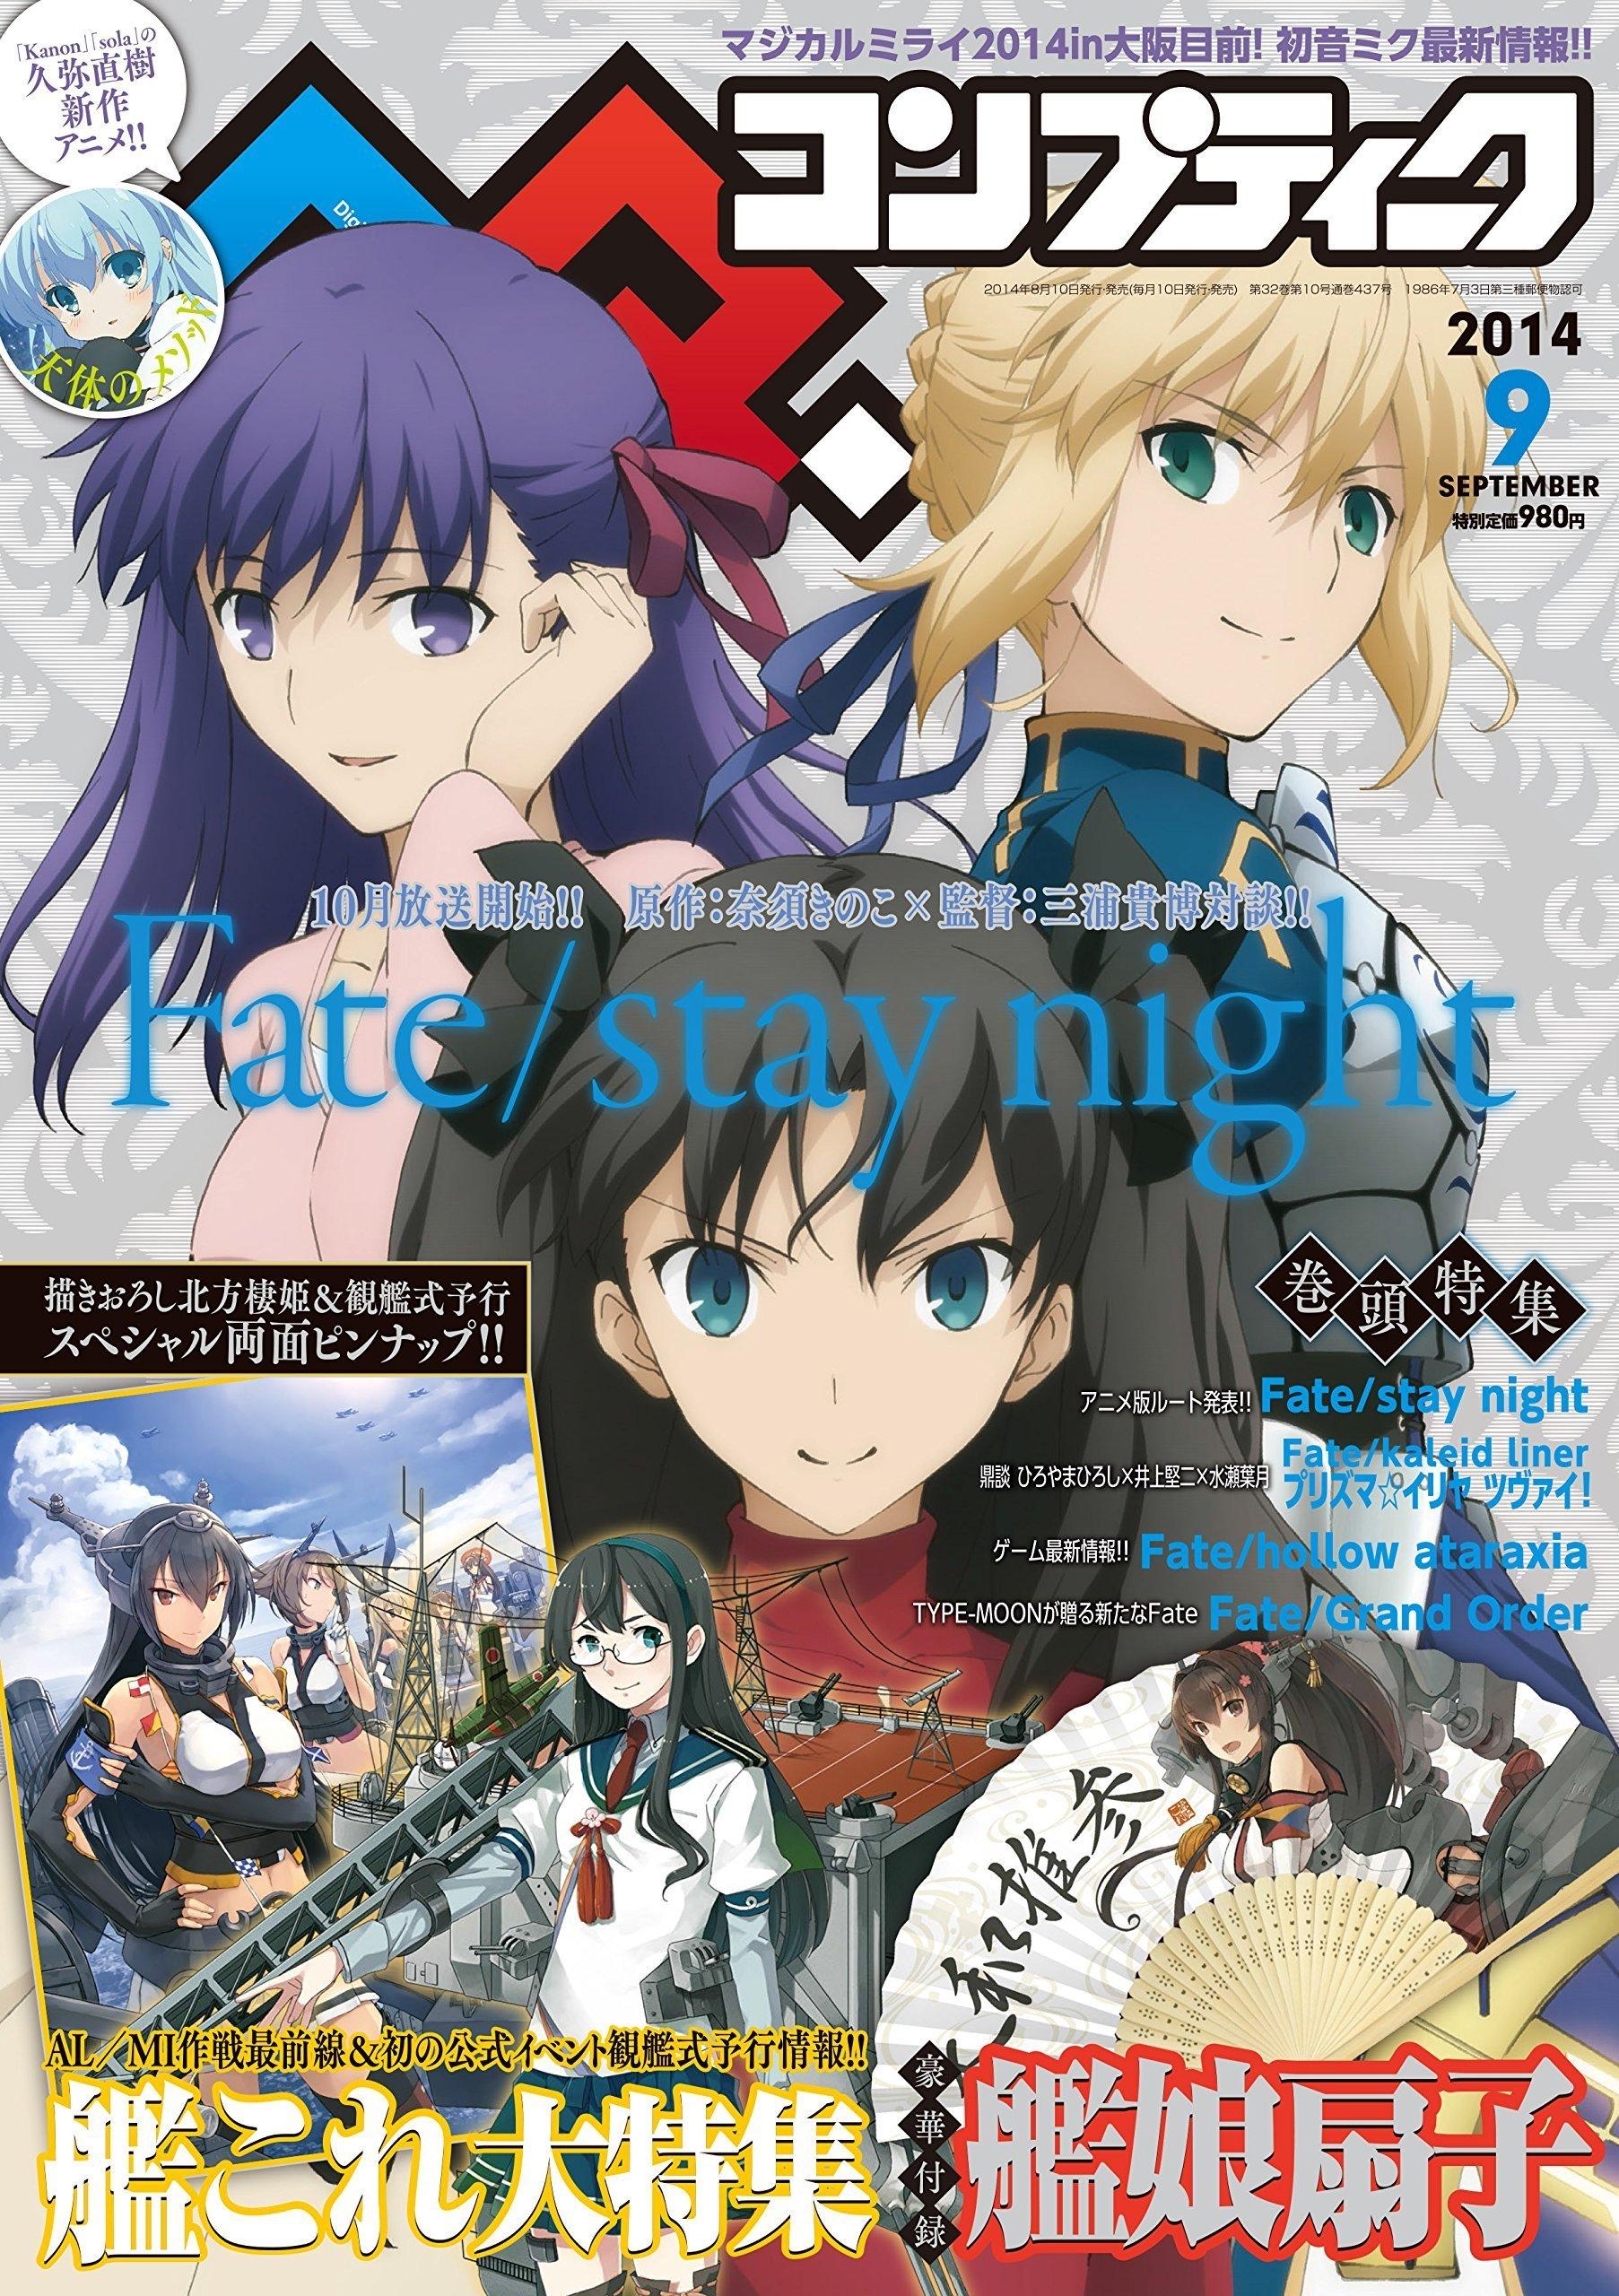 Comptiq Issue 437 (September 2014)